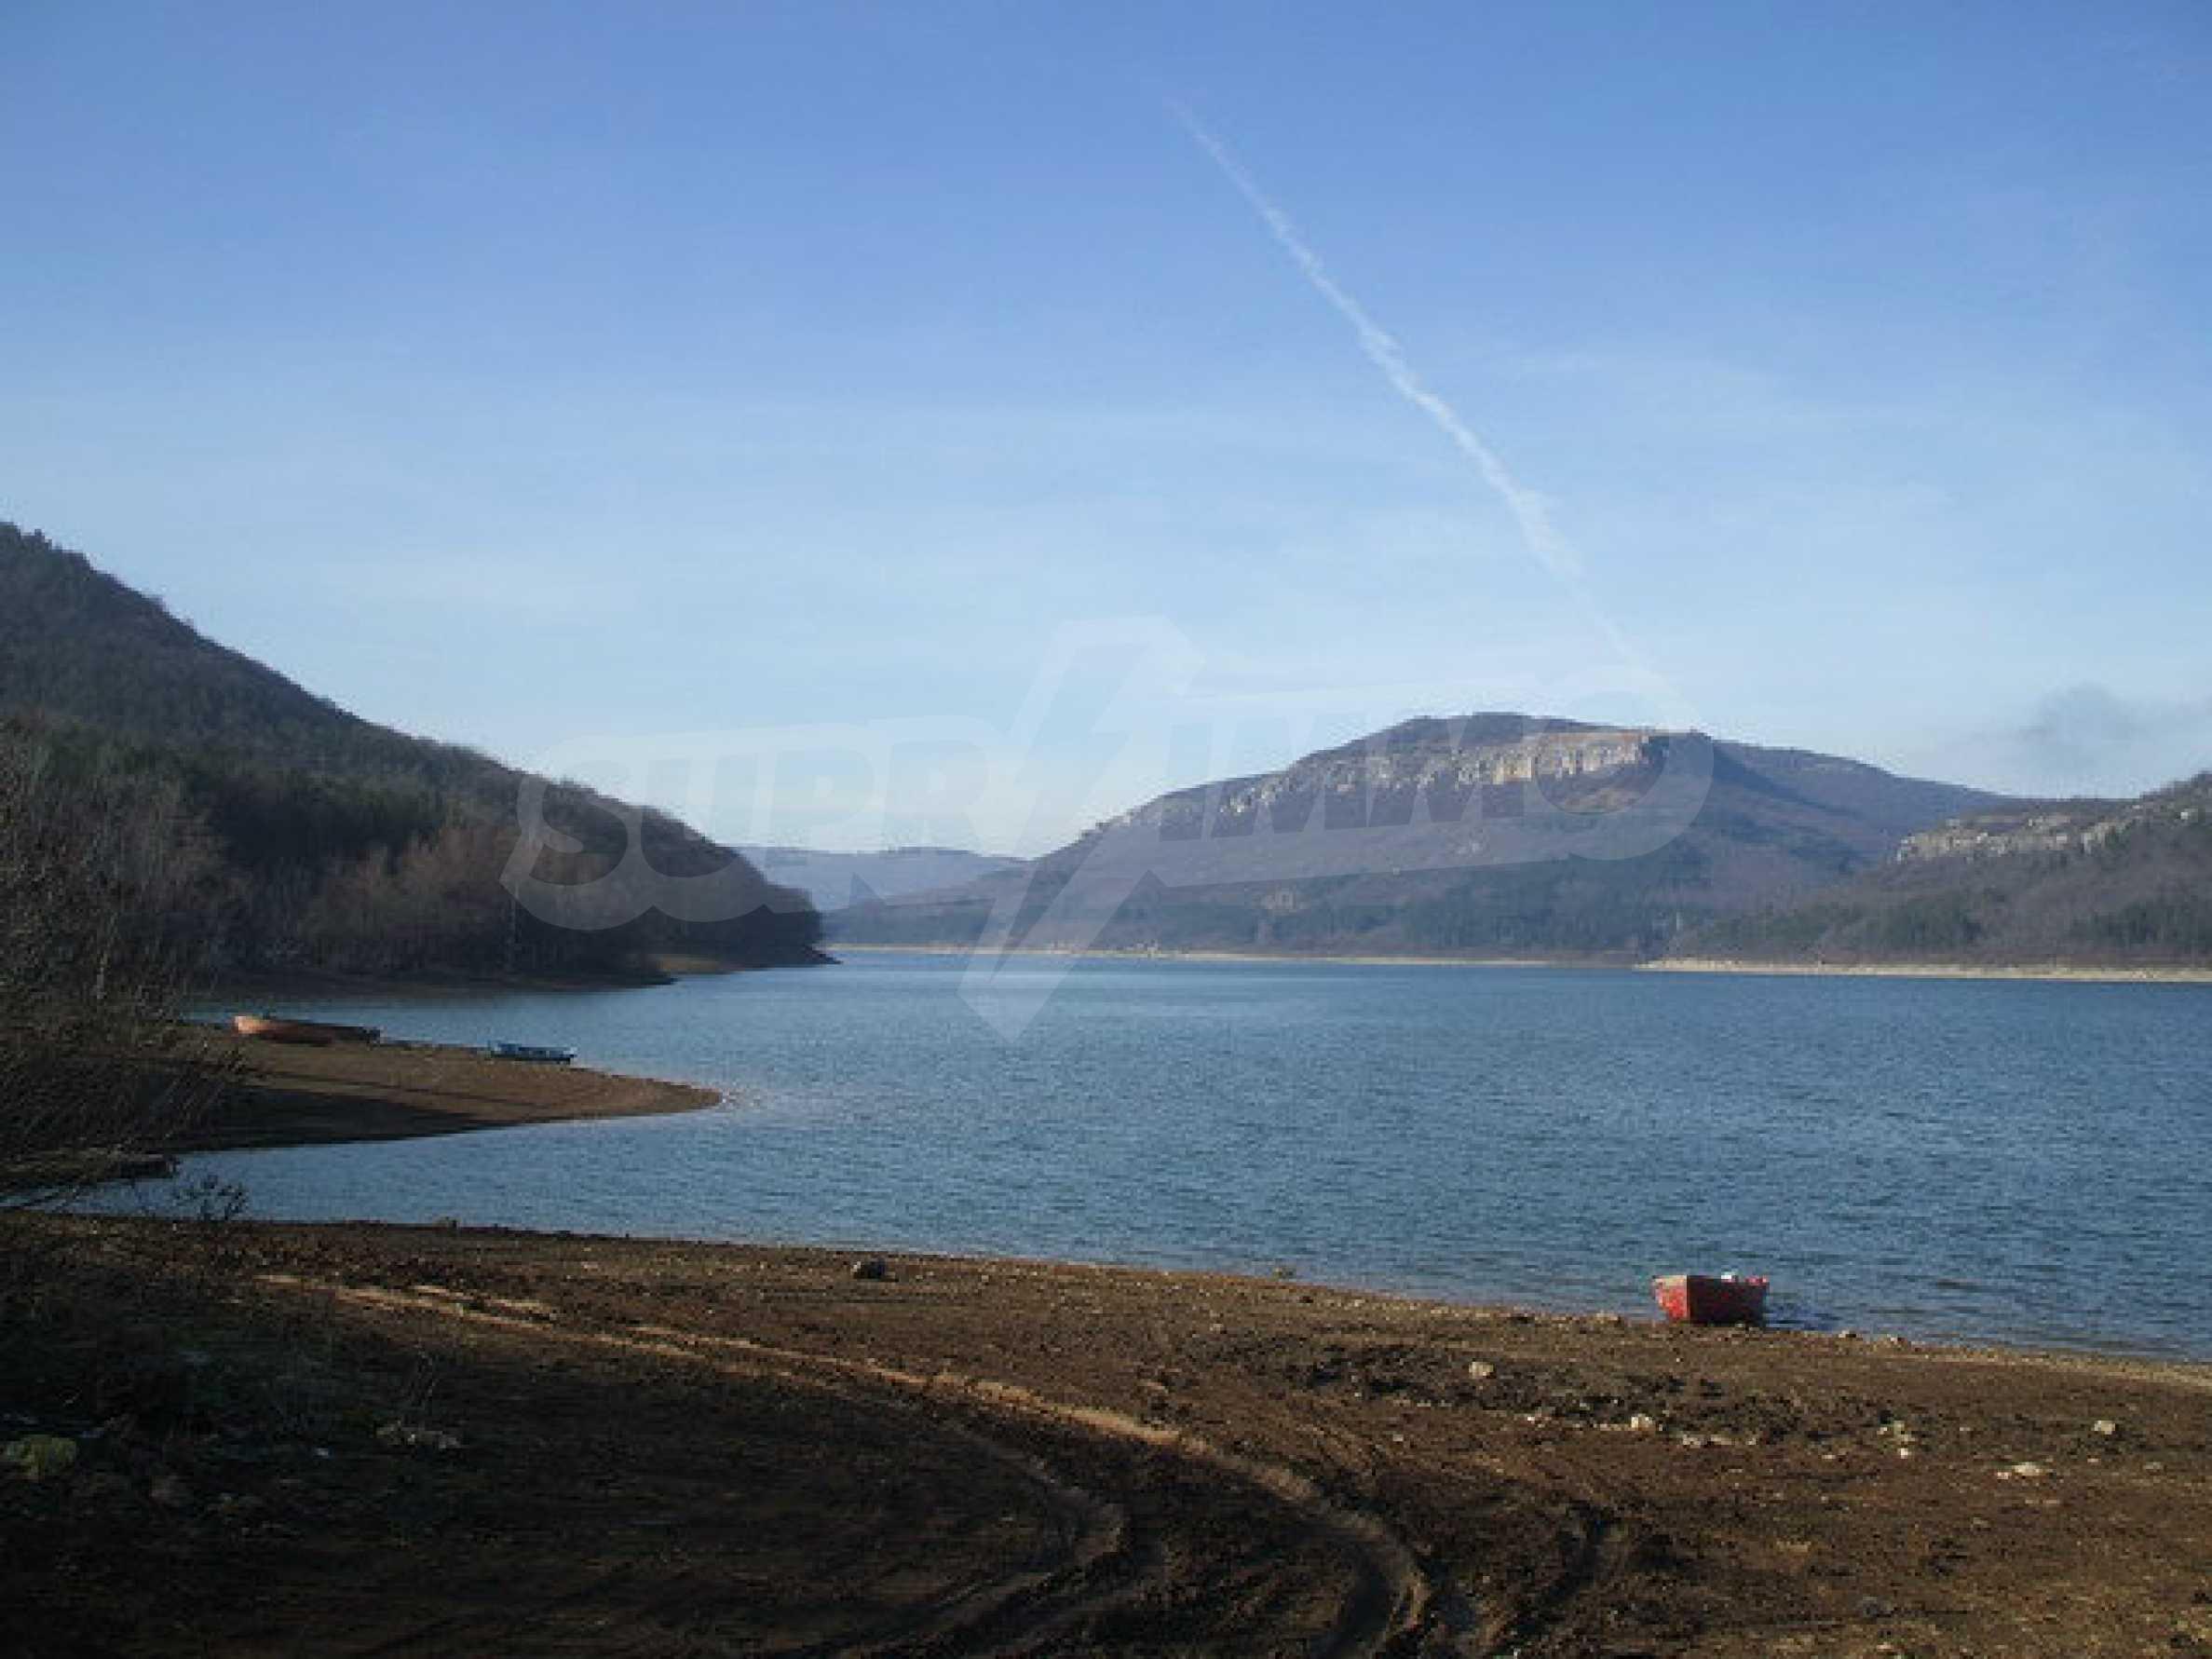 Land in regulation near Lake Alexander Stamboliyski 13